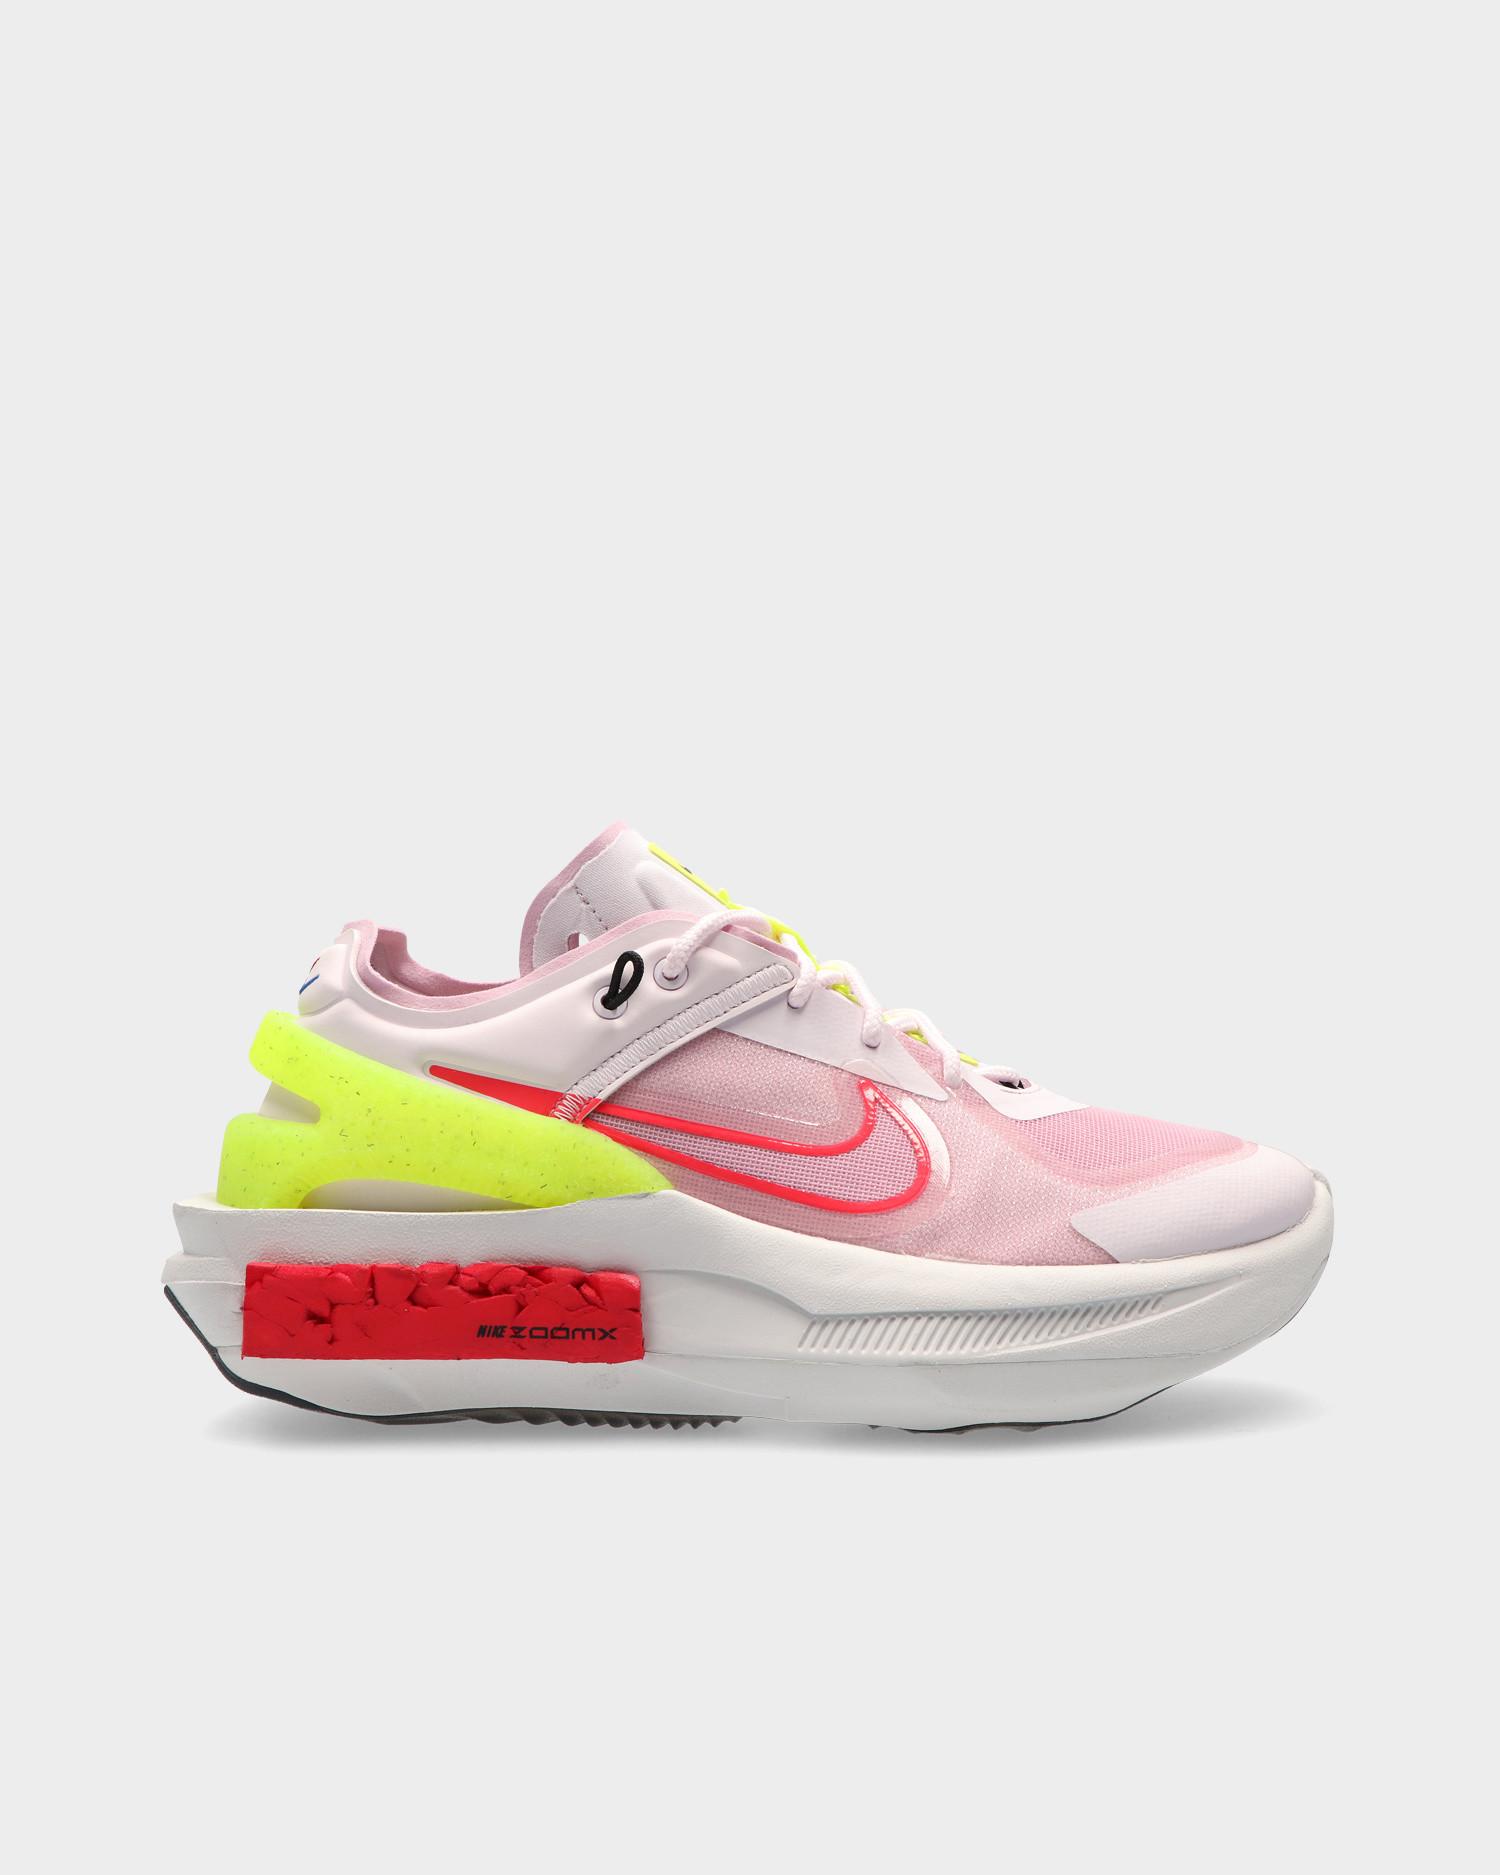 Nike Wmns Fontanka Edge Light violet/siren red-lt arctic pink